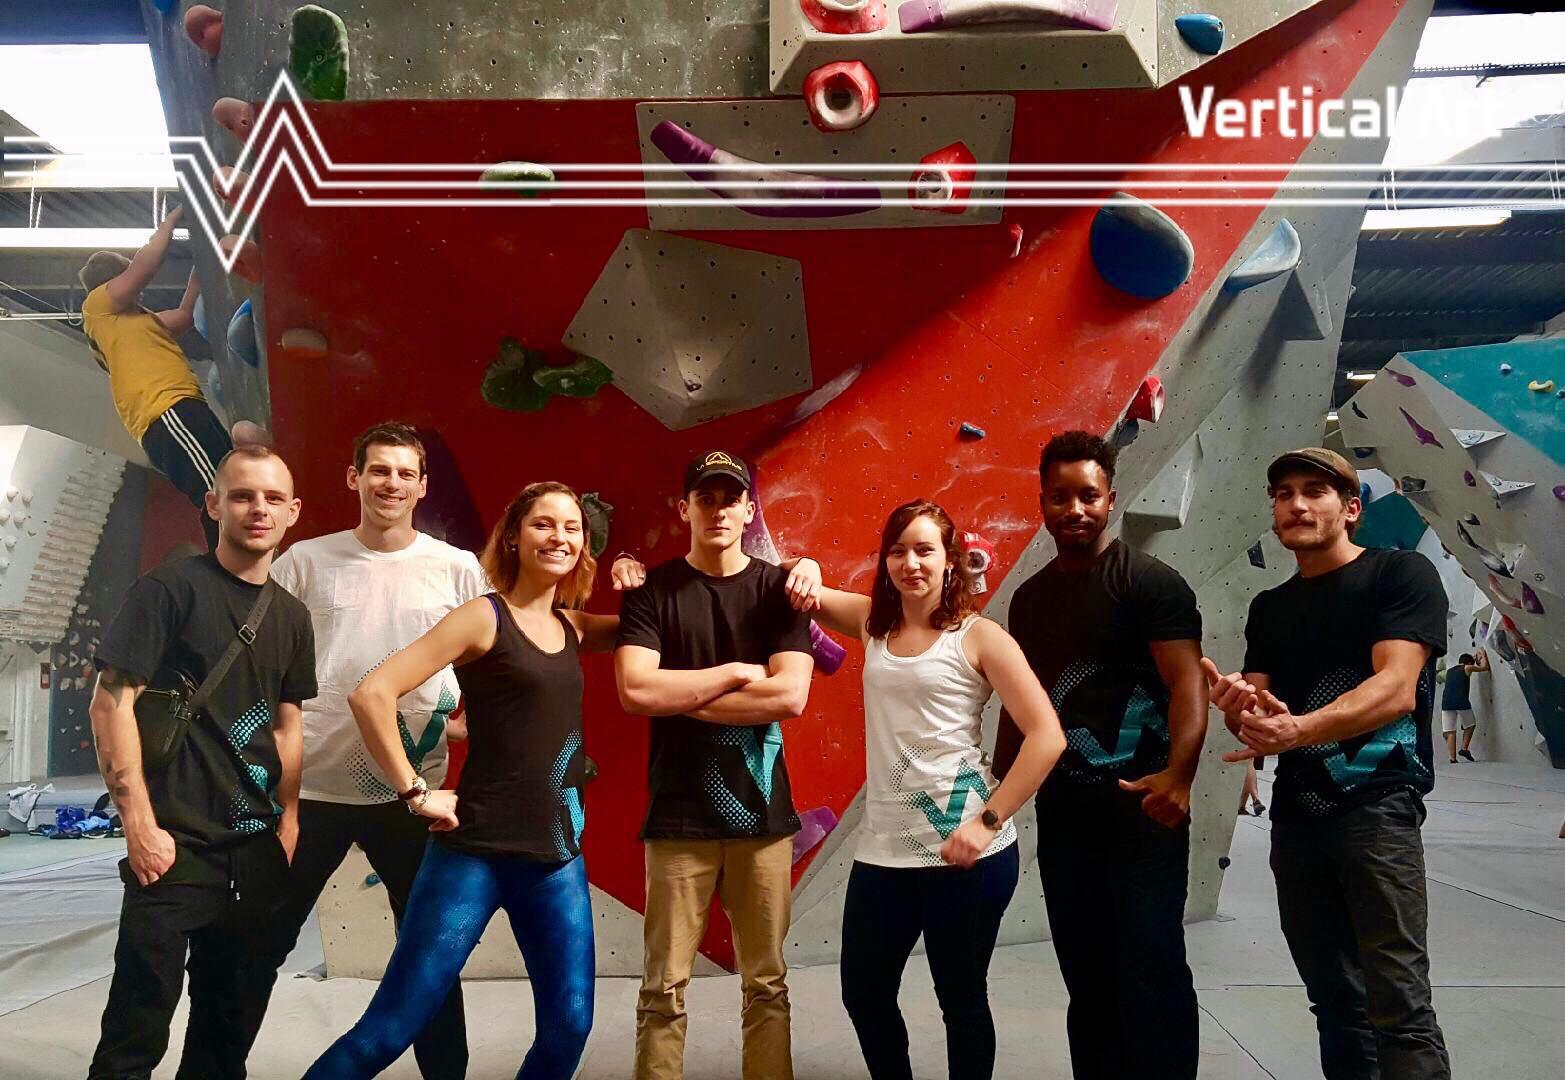 nouveaux t-shirt Vertical'Art - Lyon - salle d'escalade restaurant et bar